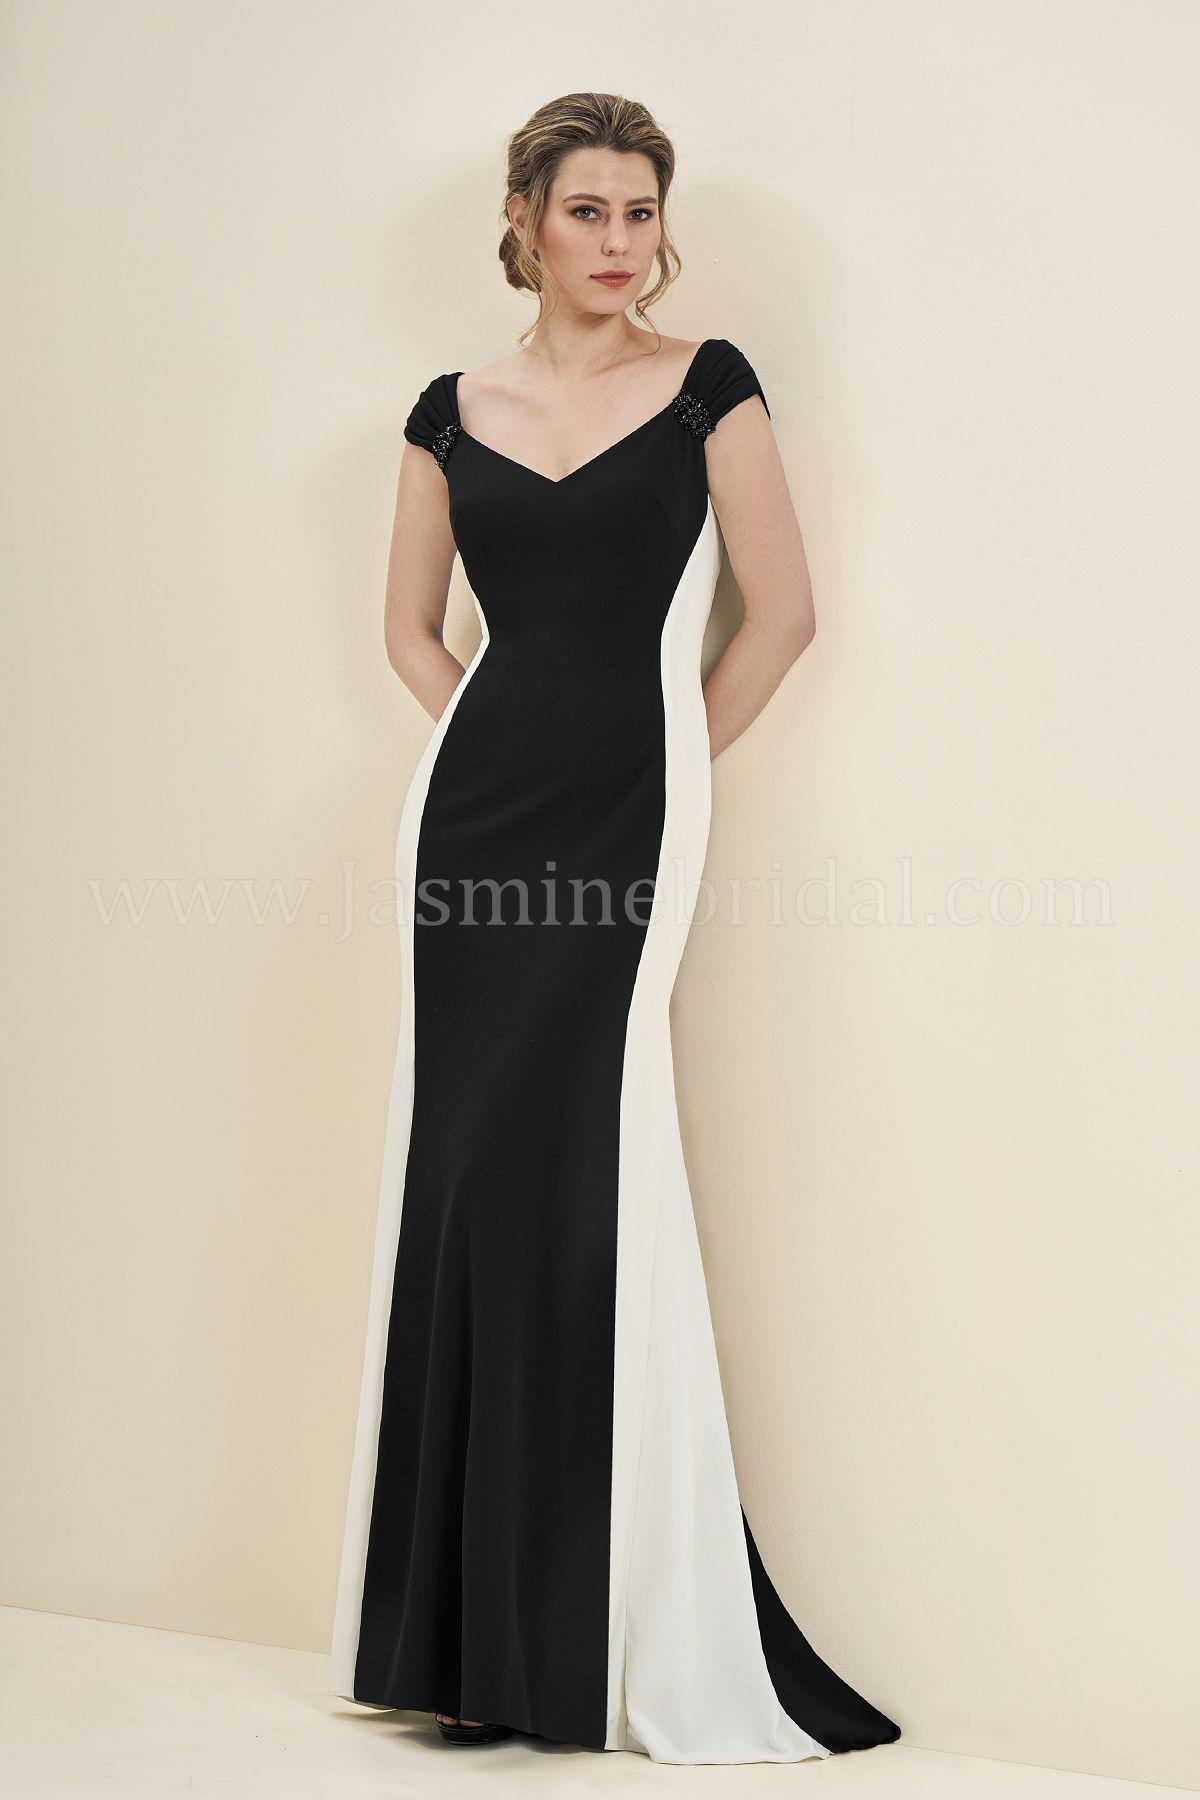 J195054 Long V Neck Stretch Crepe Mob Dress